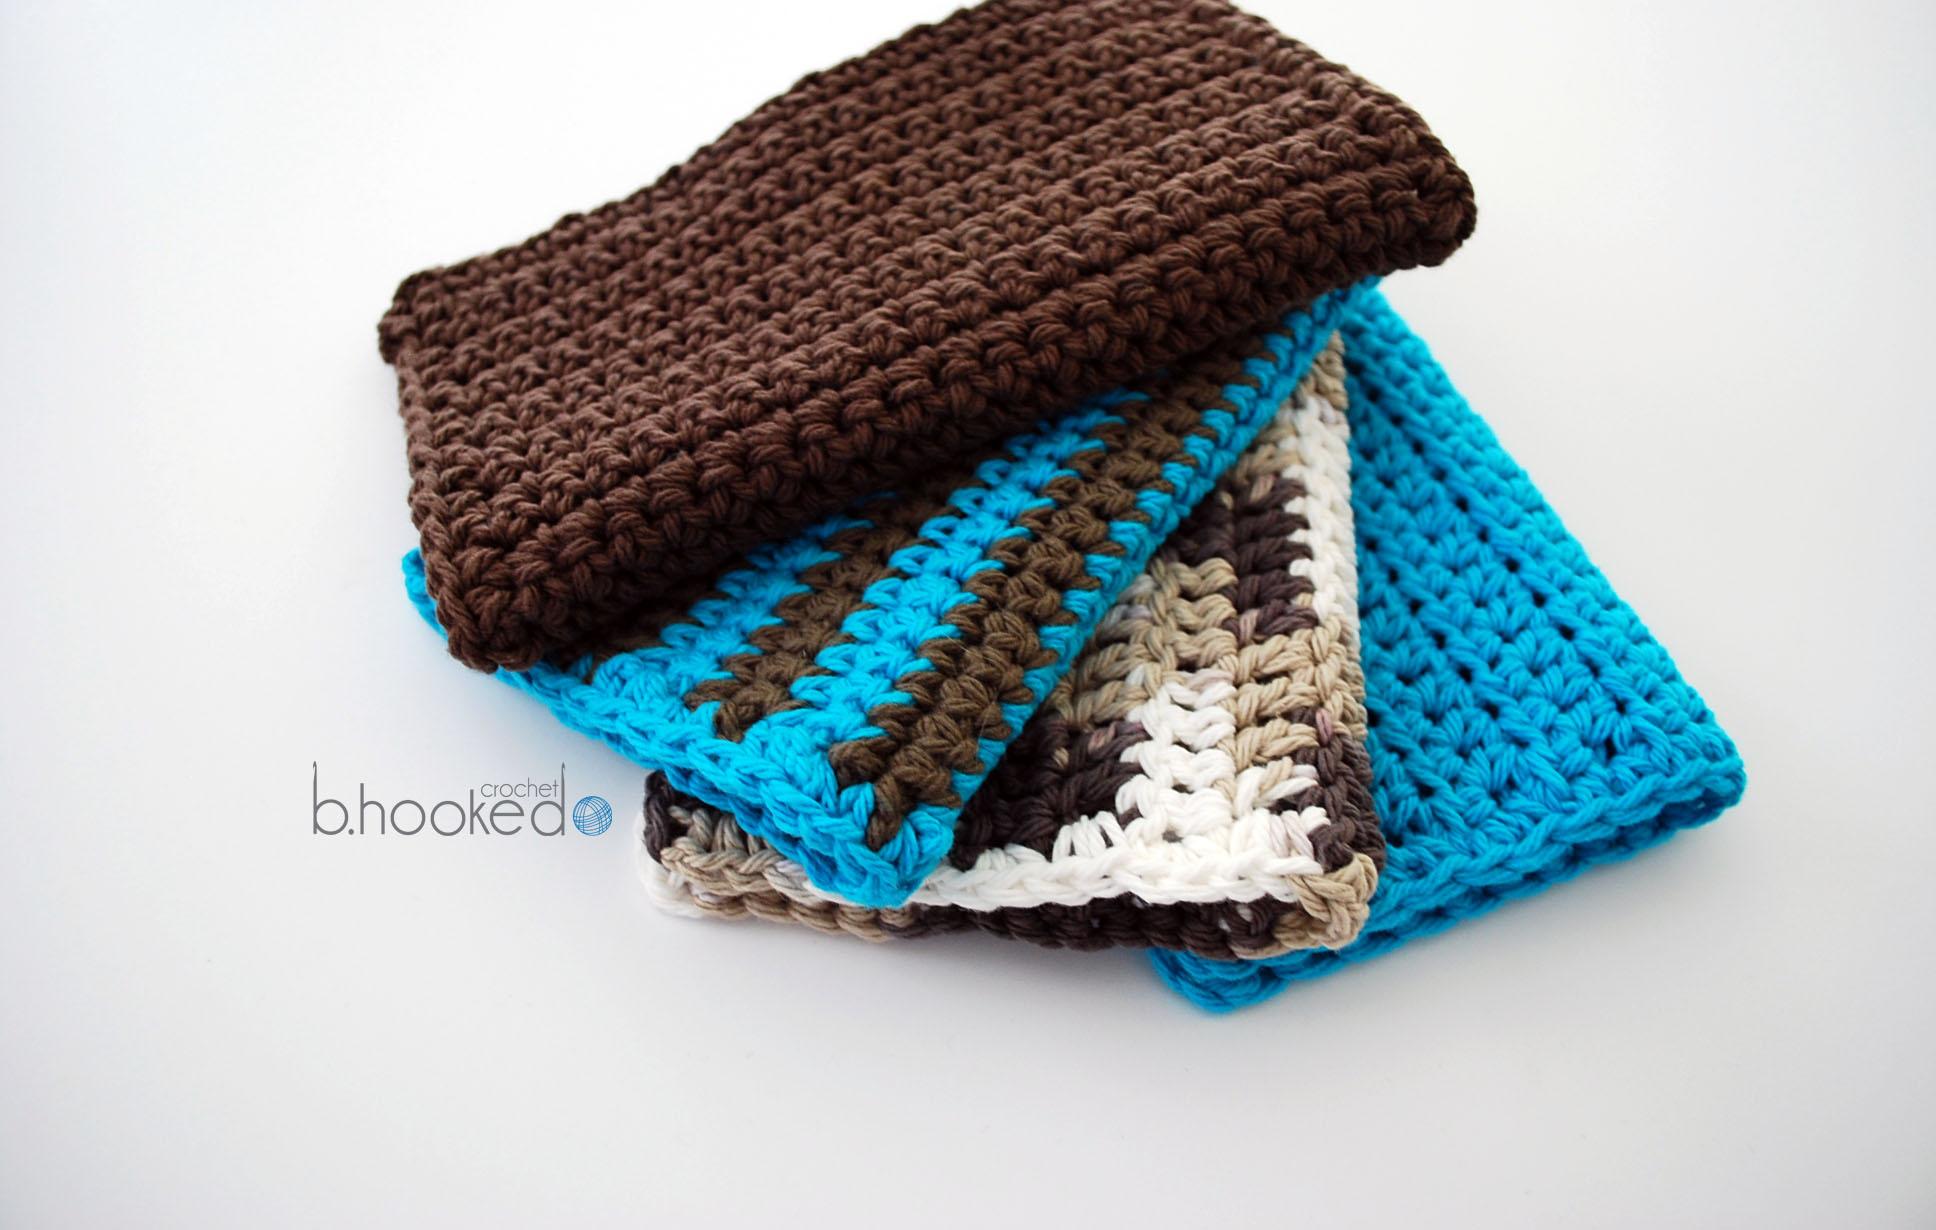 Hooked On Crochet